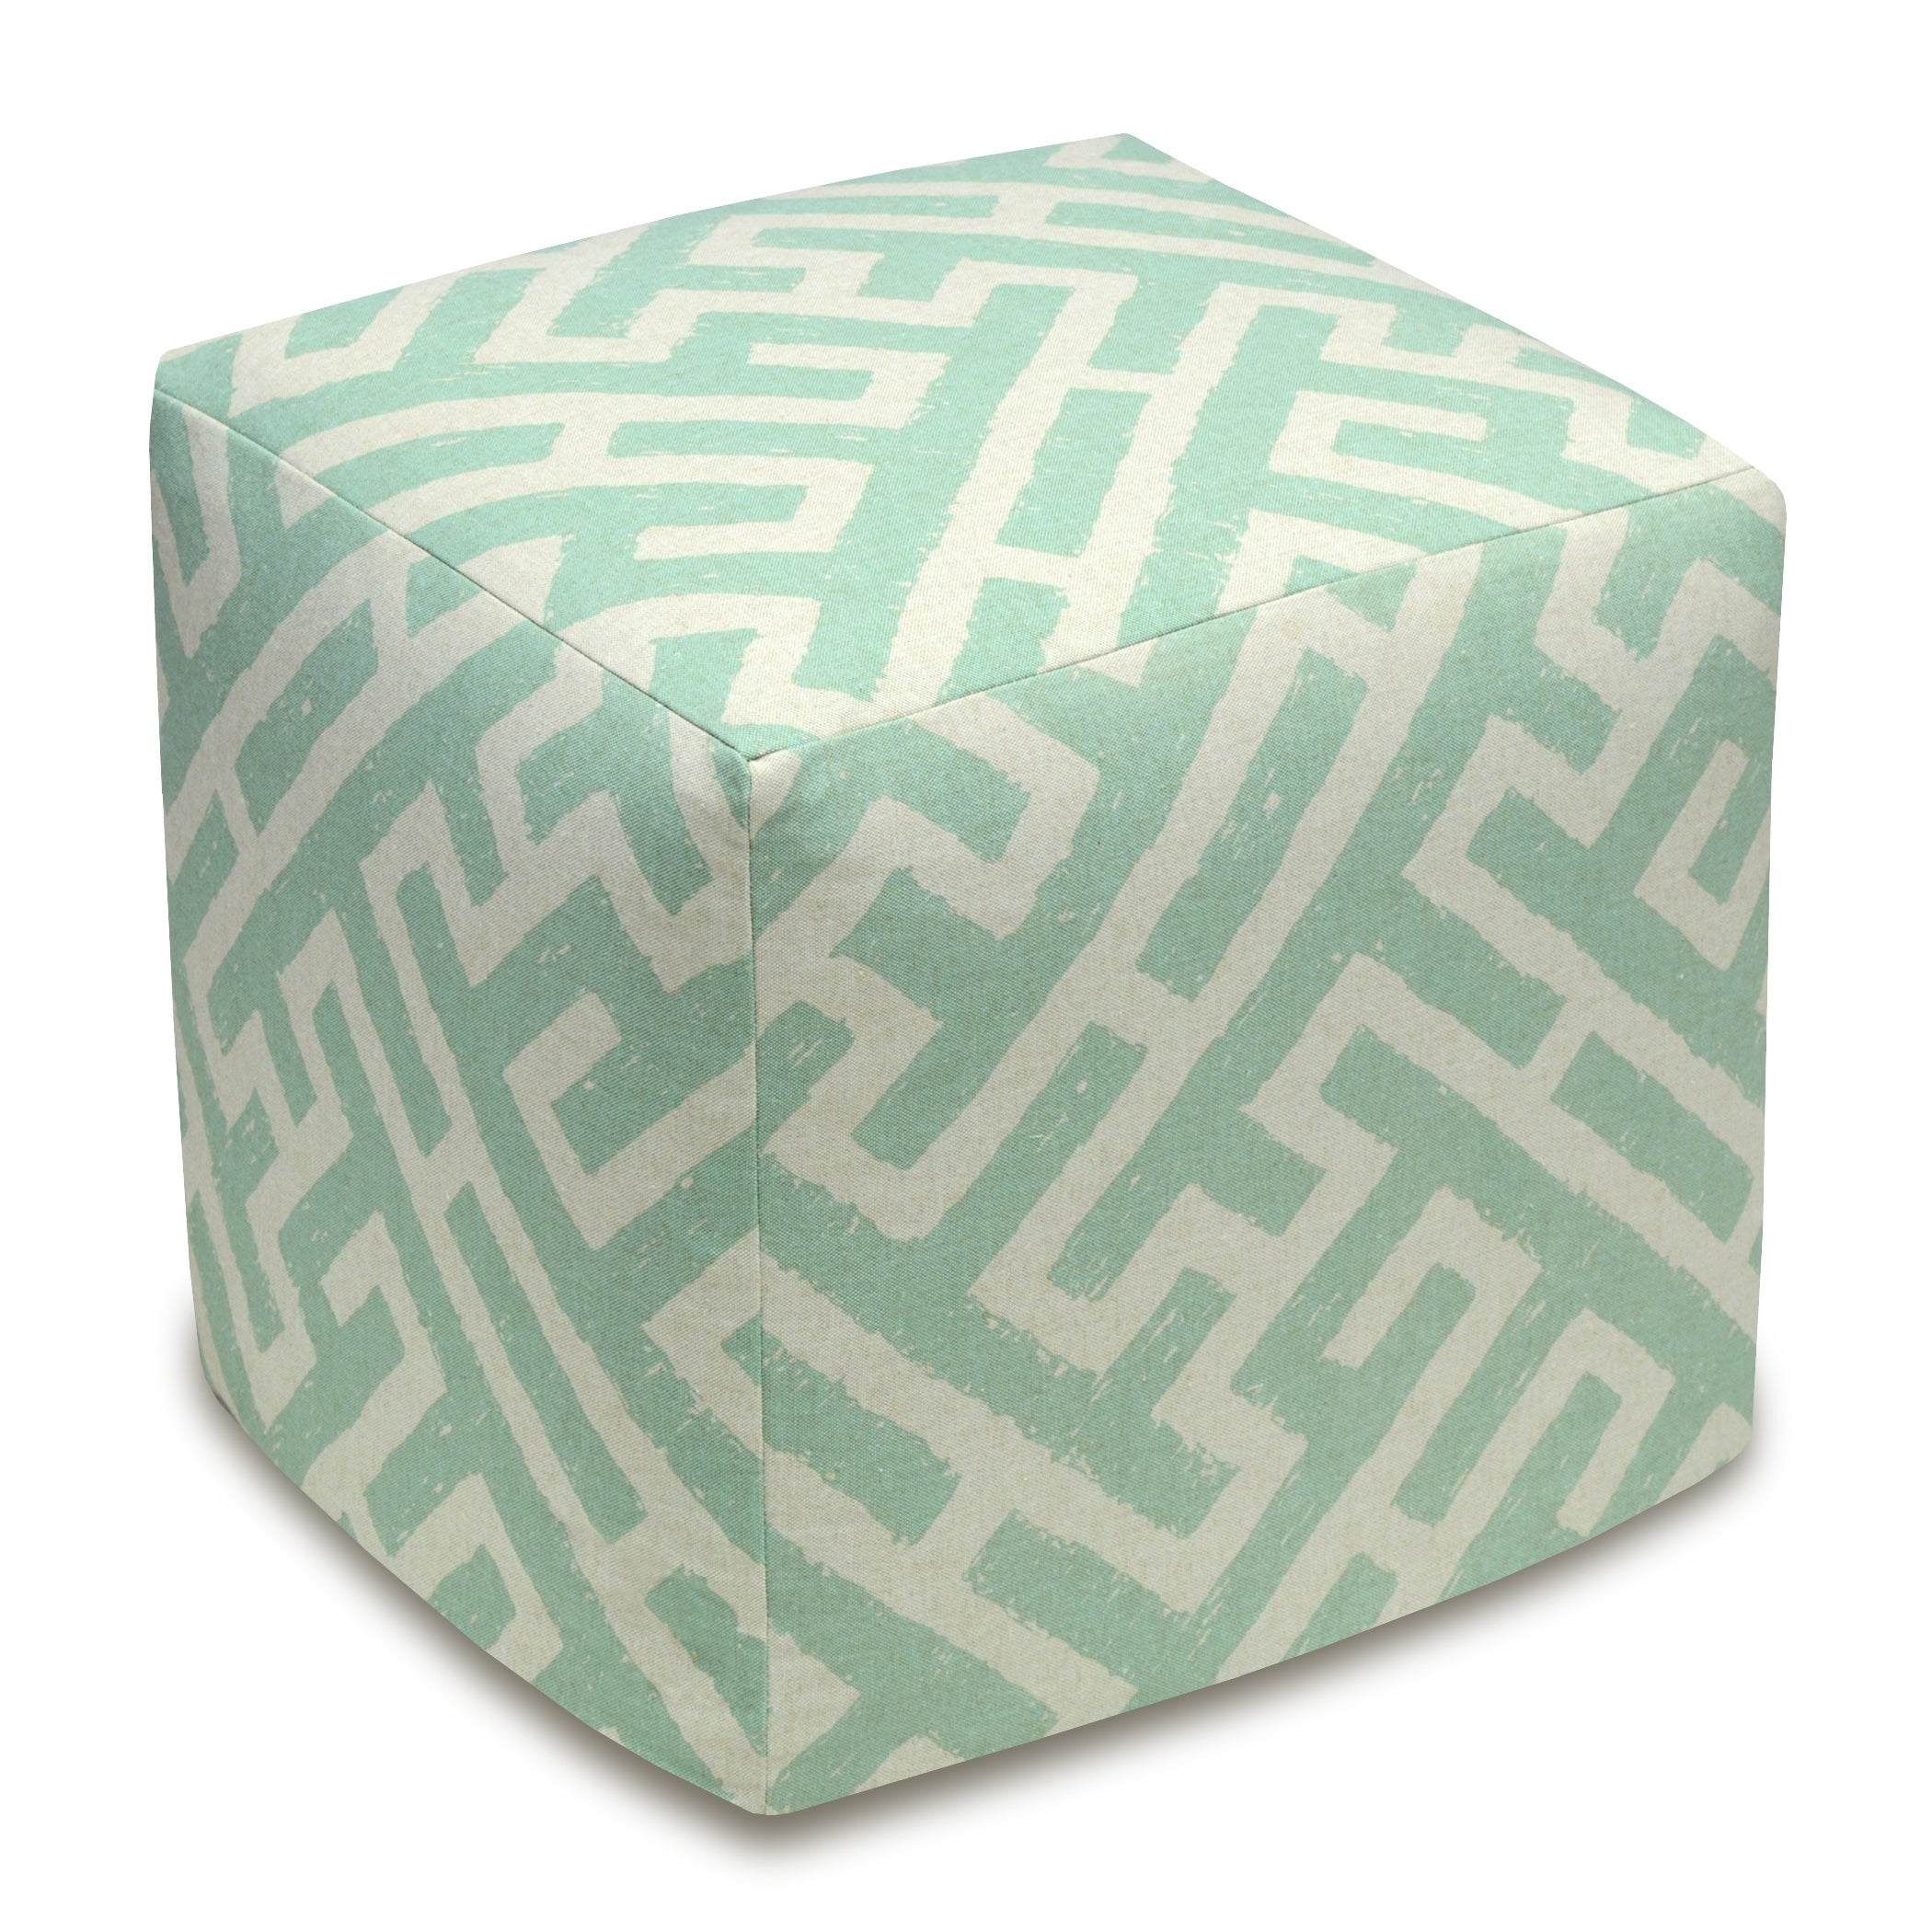 Lattice Linen Upholstered Cube Ottoman (Blue), Size Small...